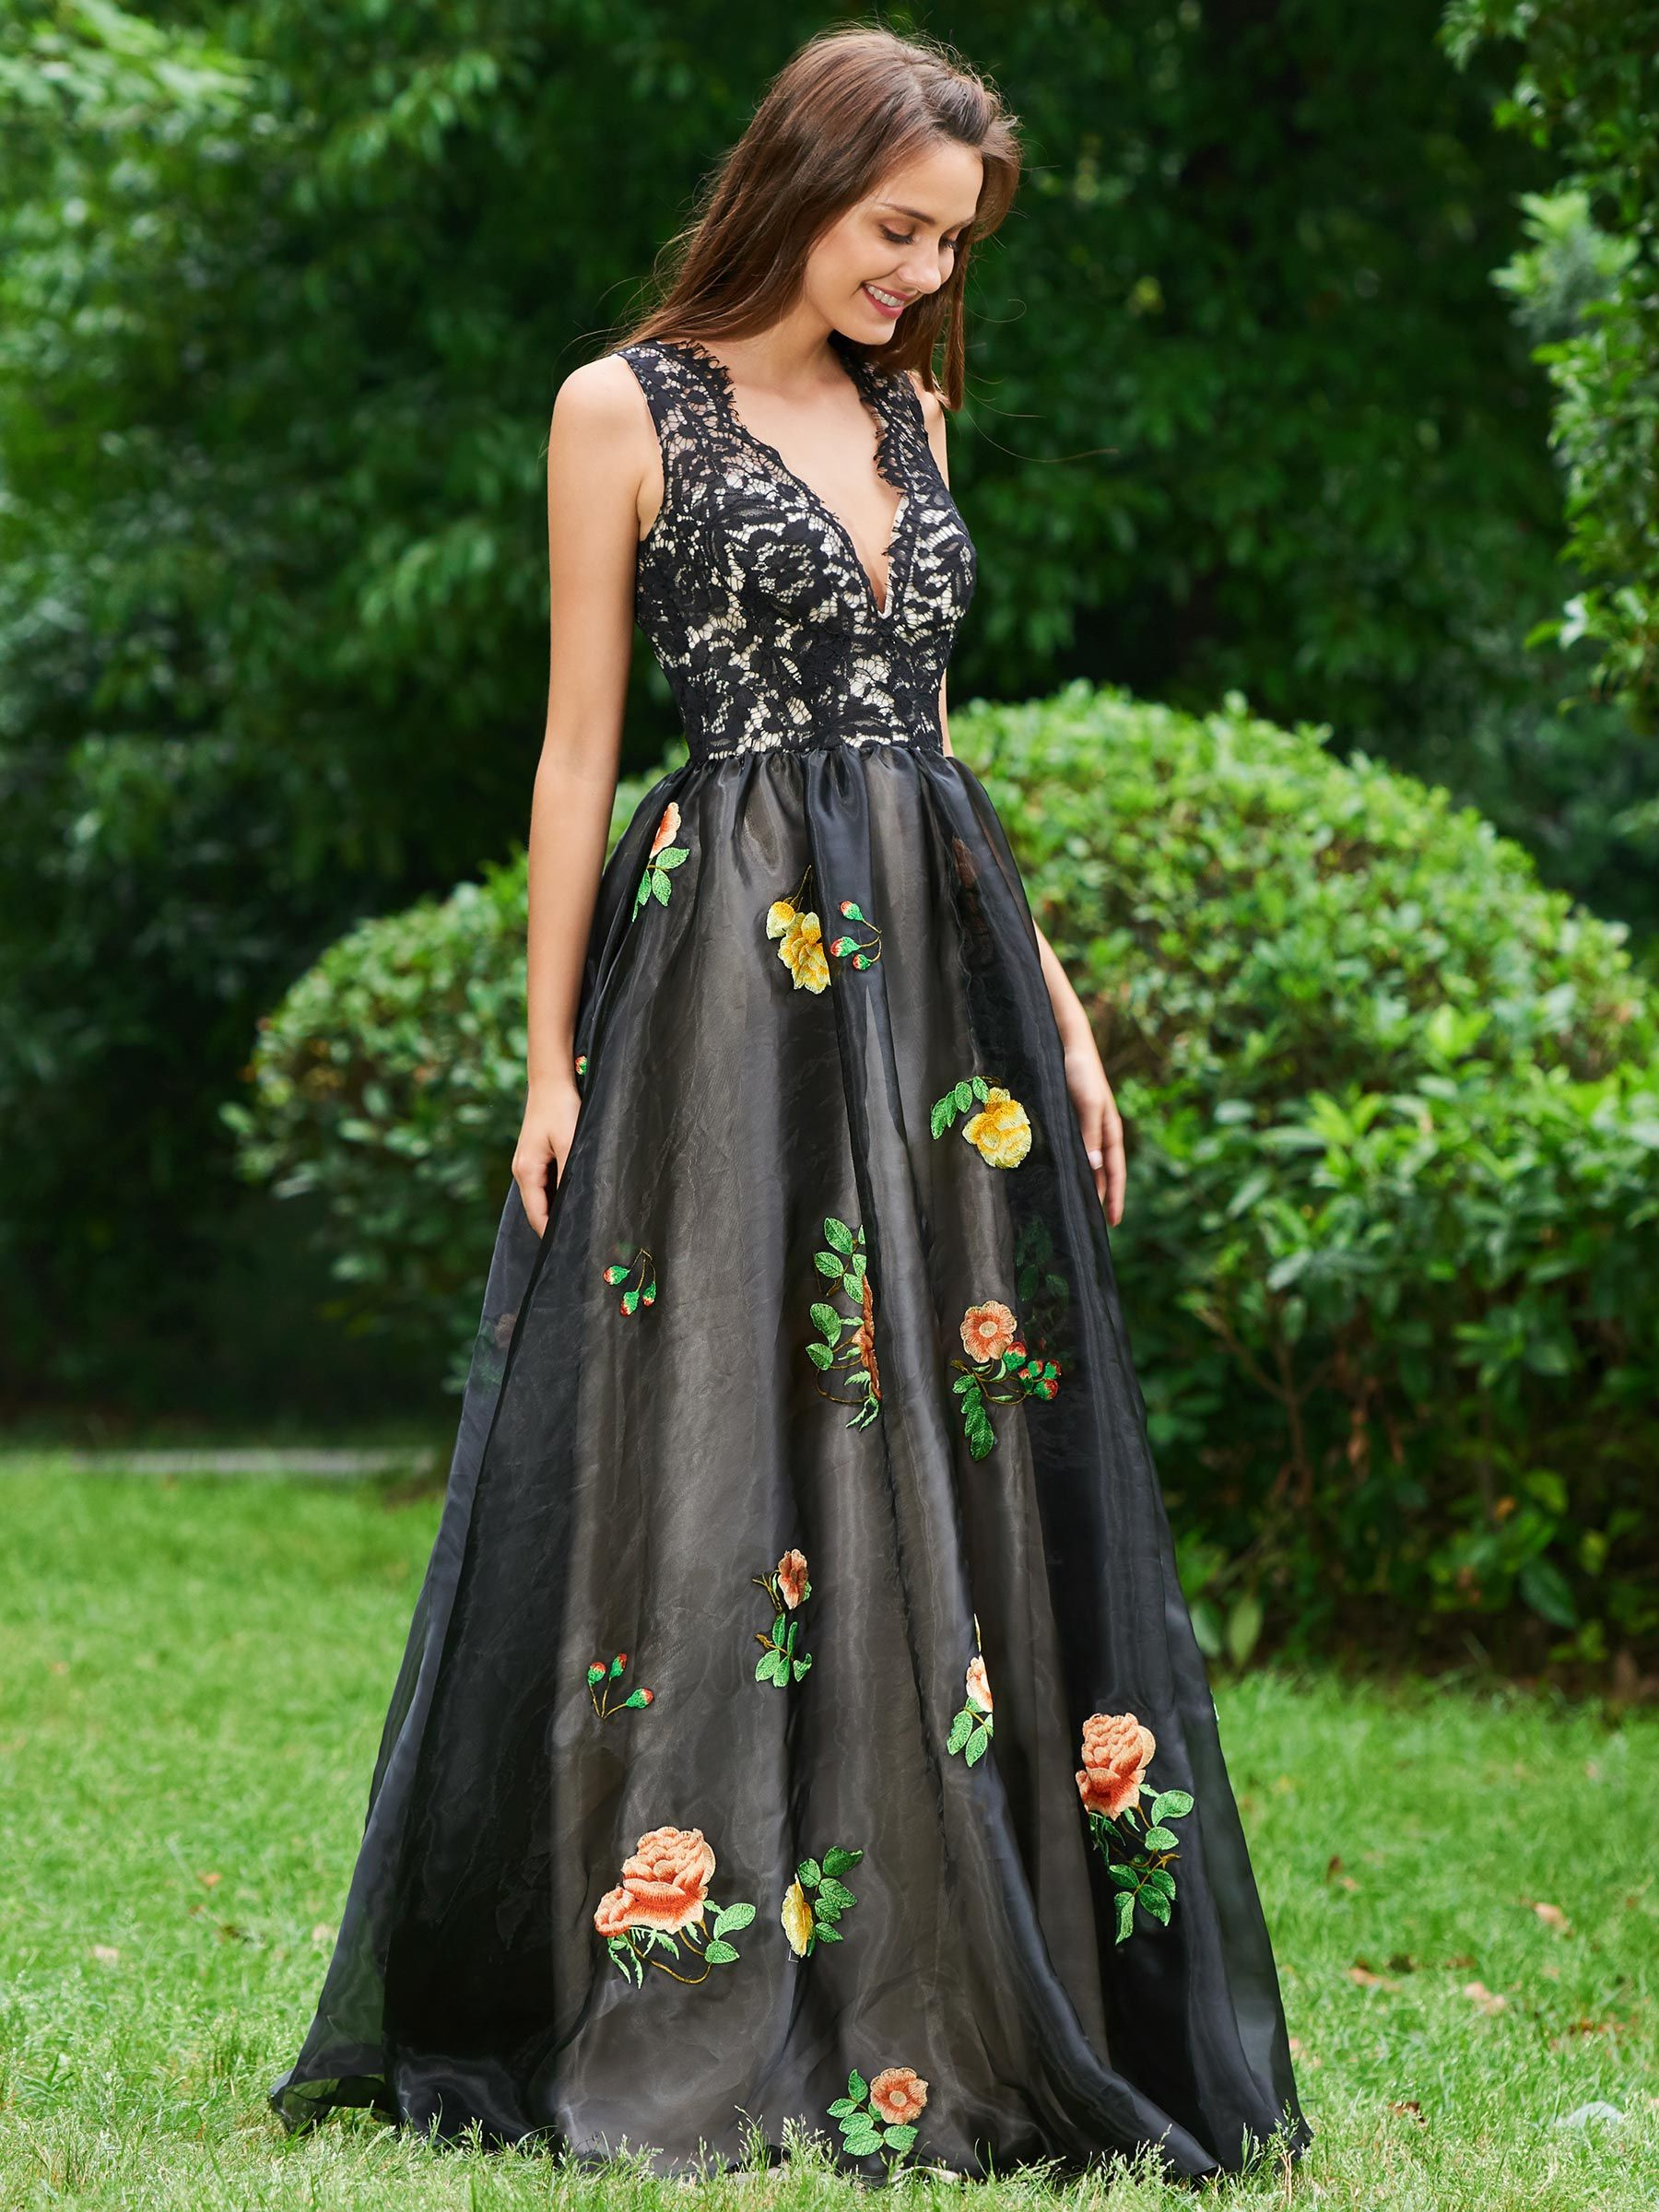 Aline vneck embroidery lace prom dress style pinterest prom